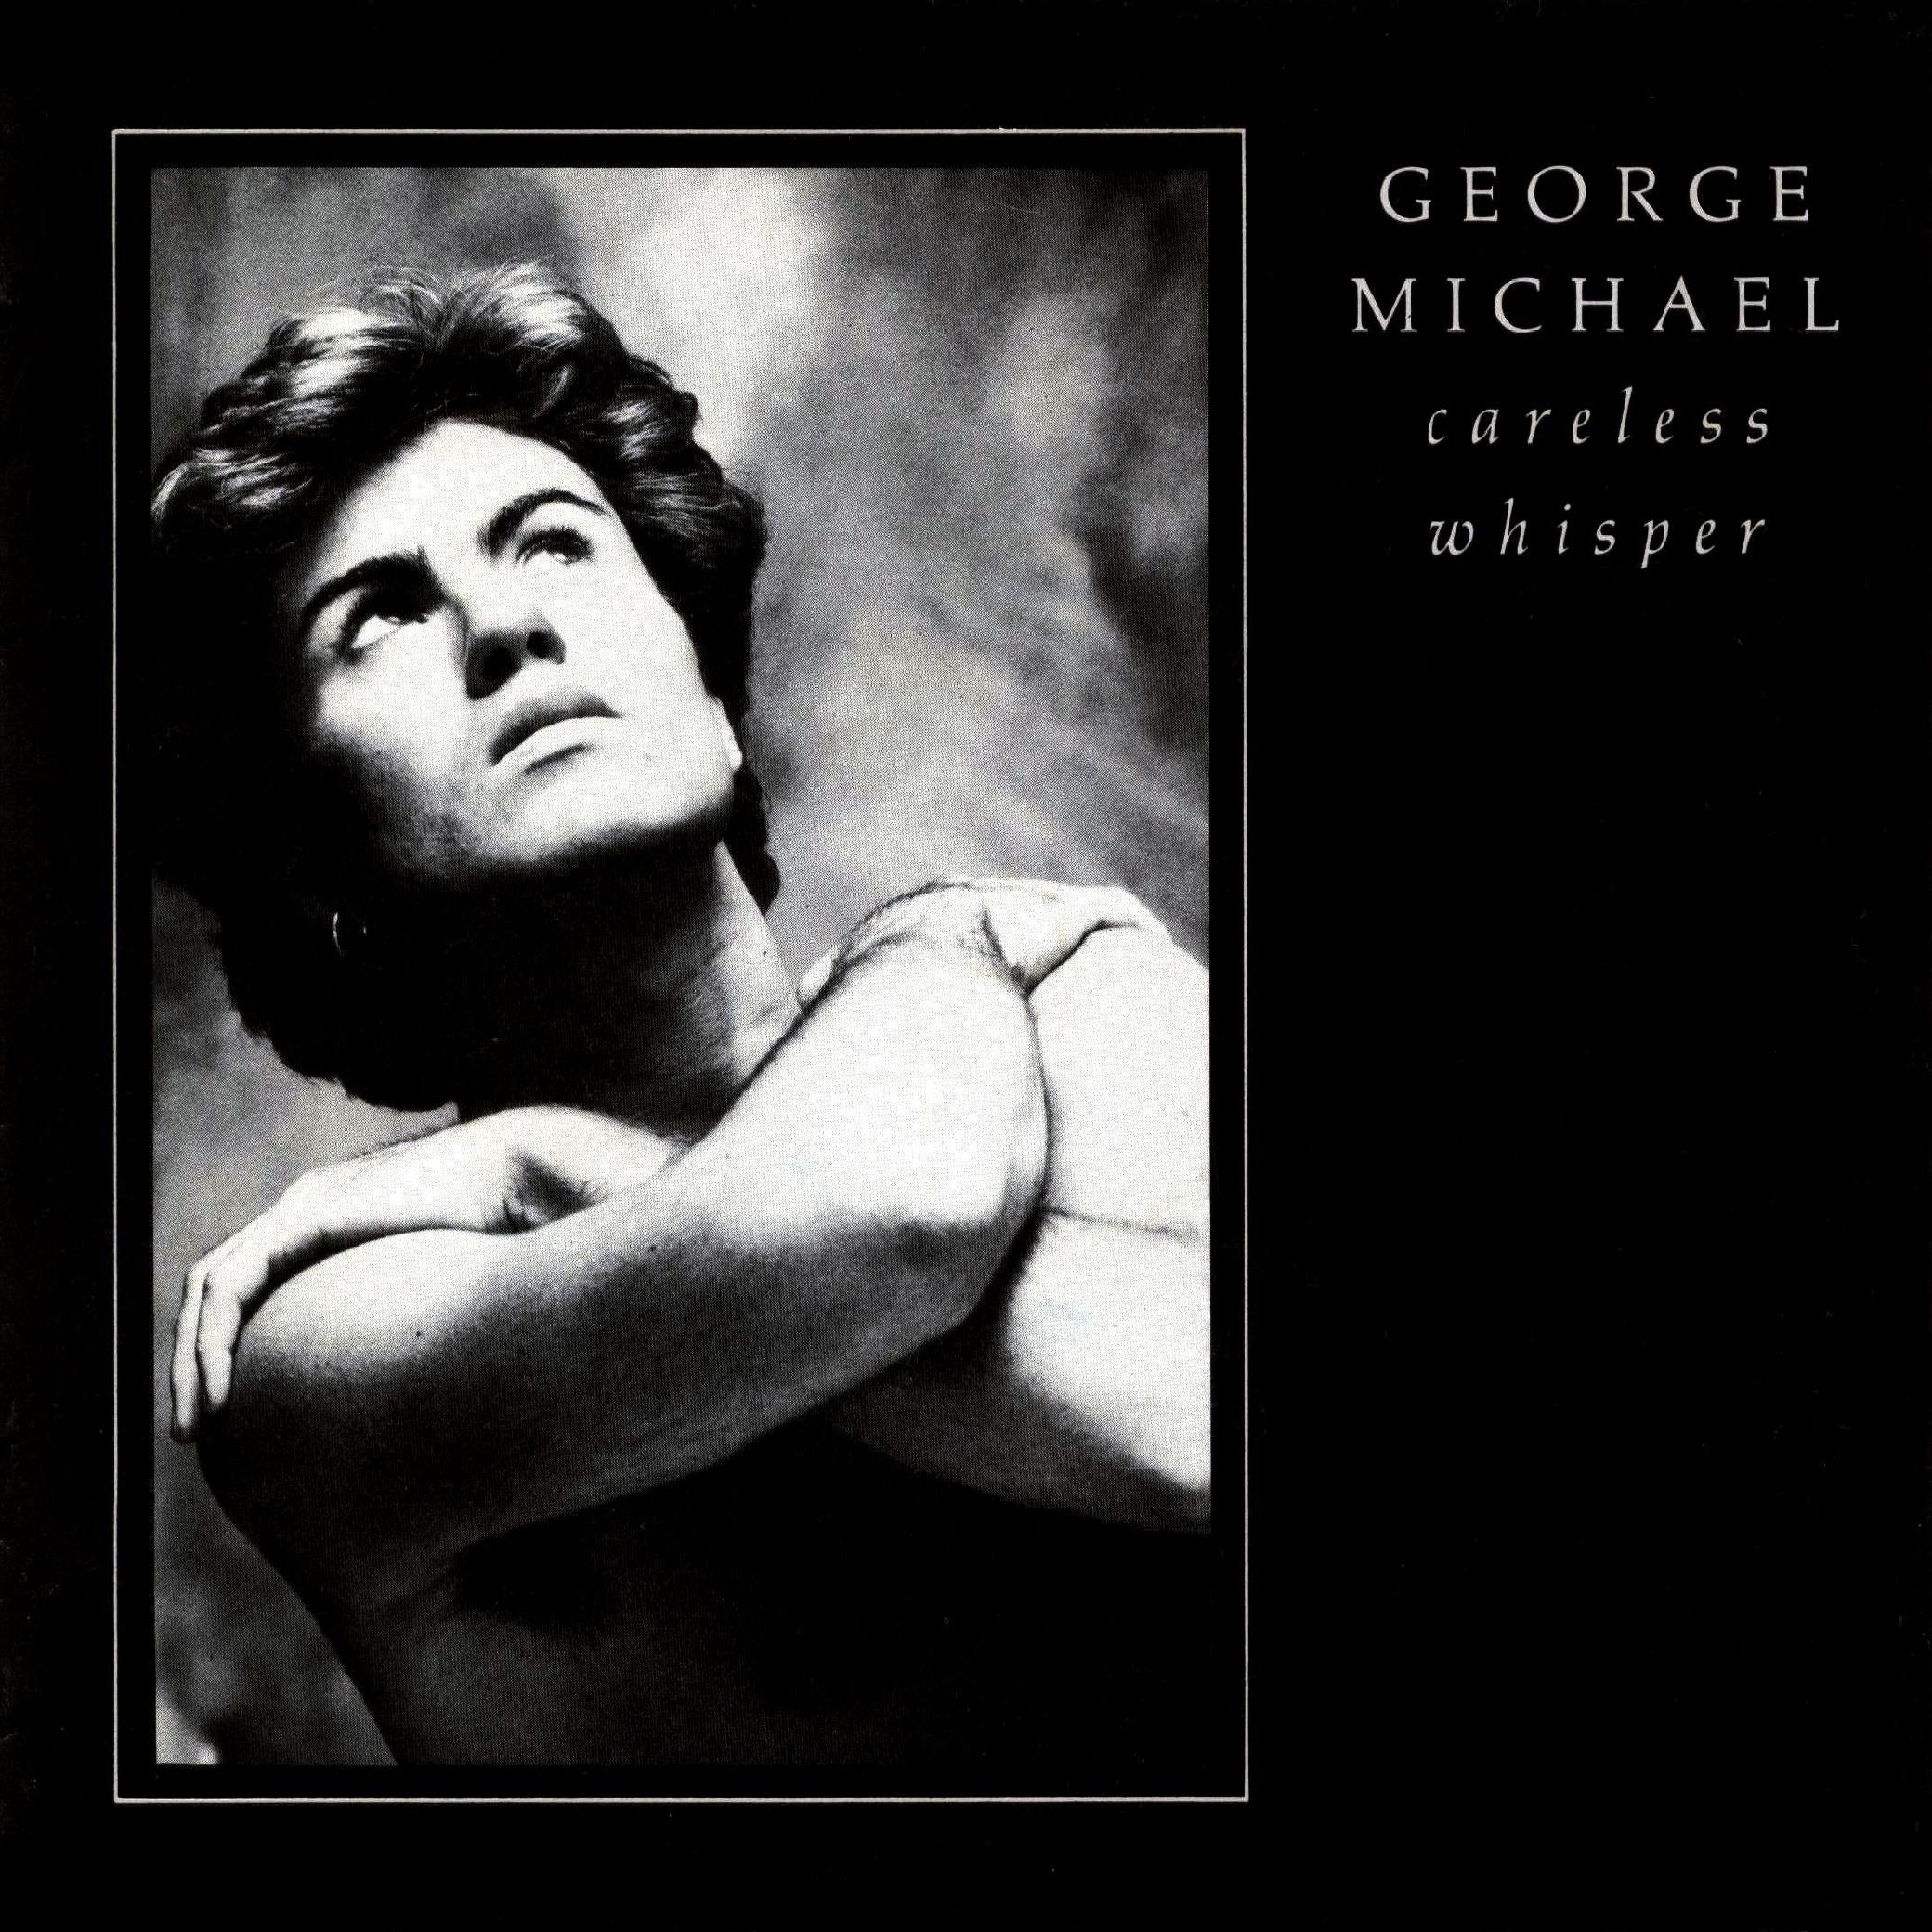 George Michael – Careless Whisper (single cover art)